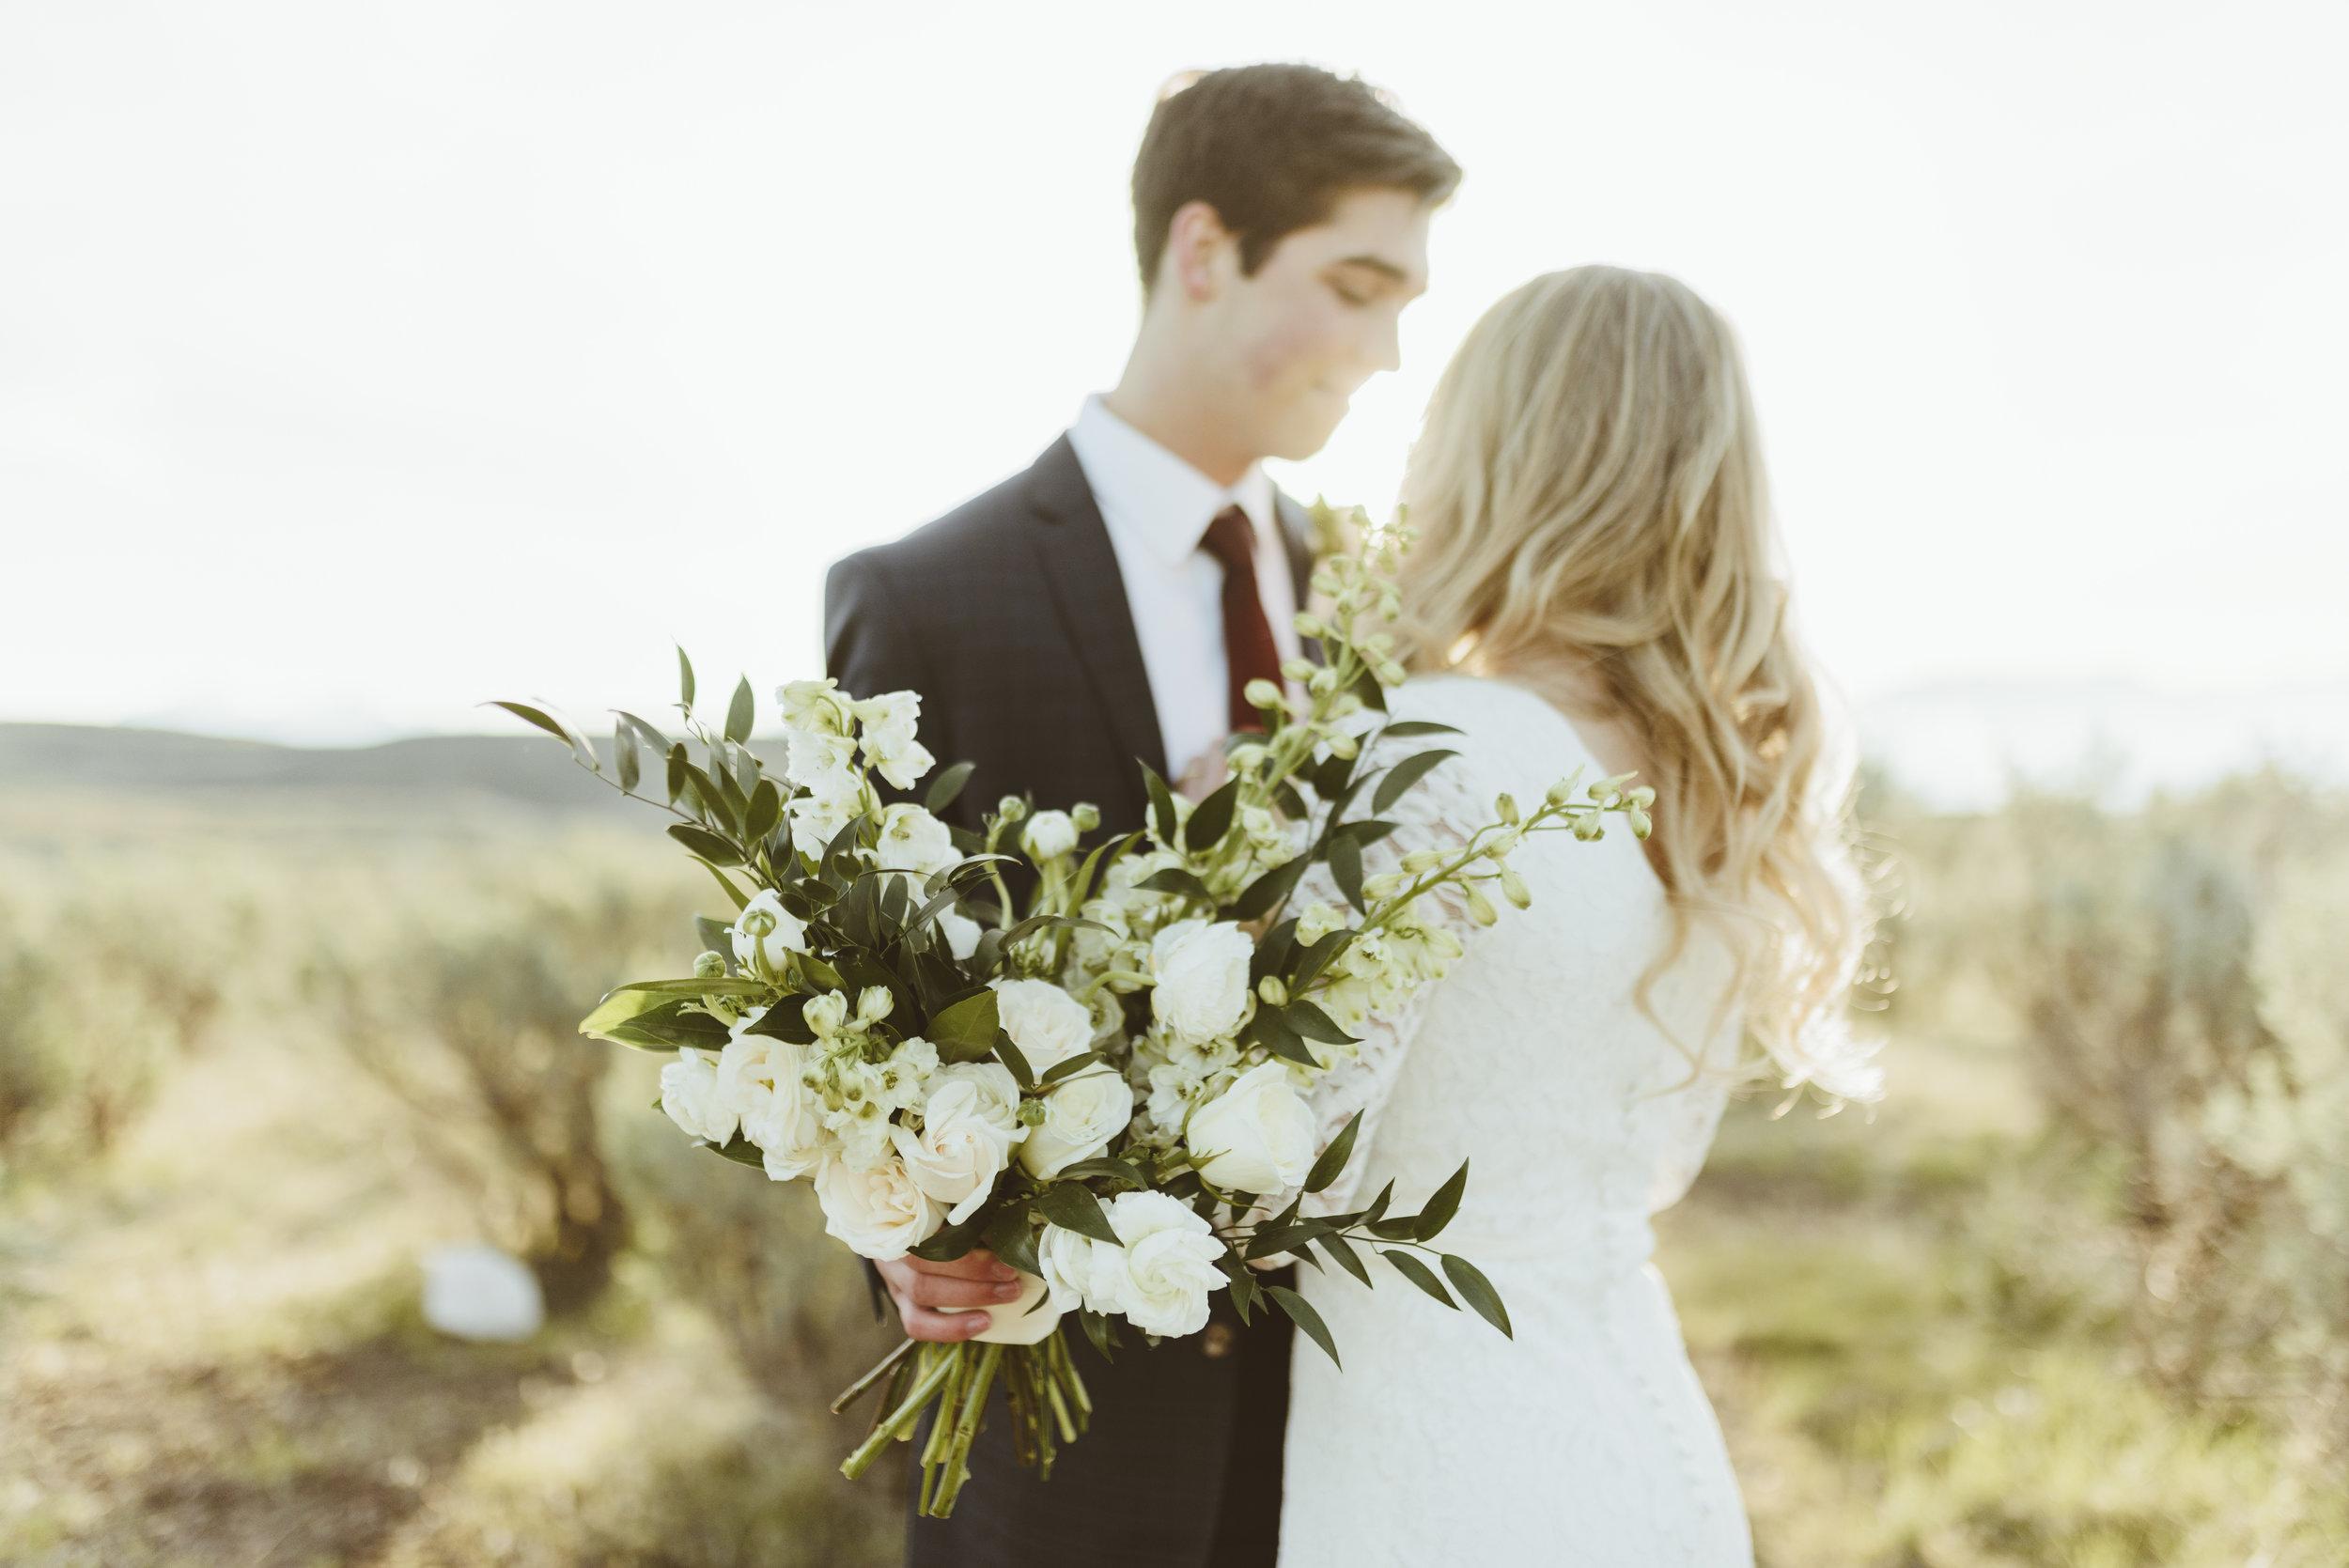 md_bridals-107.jpg